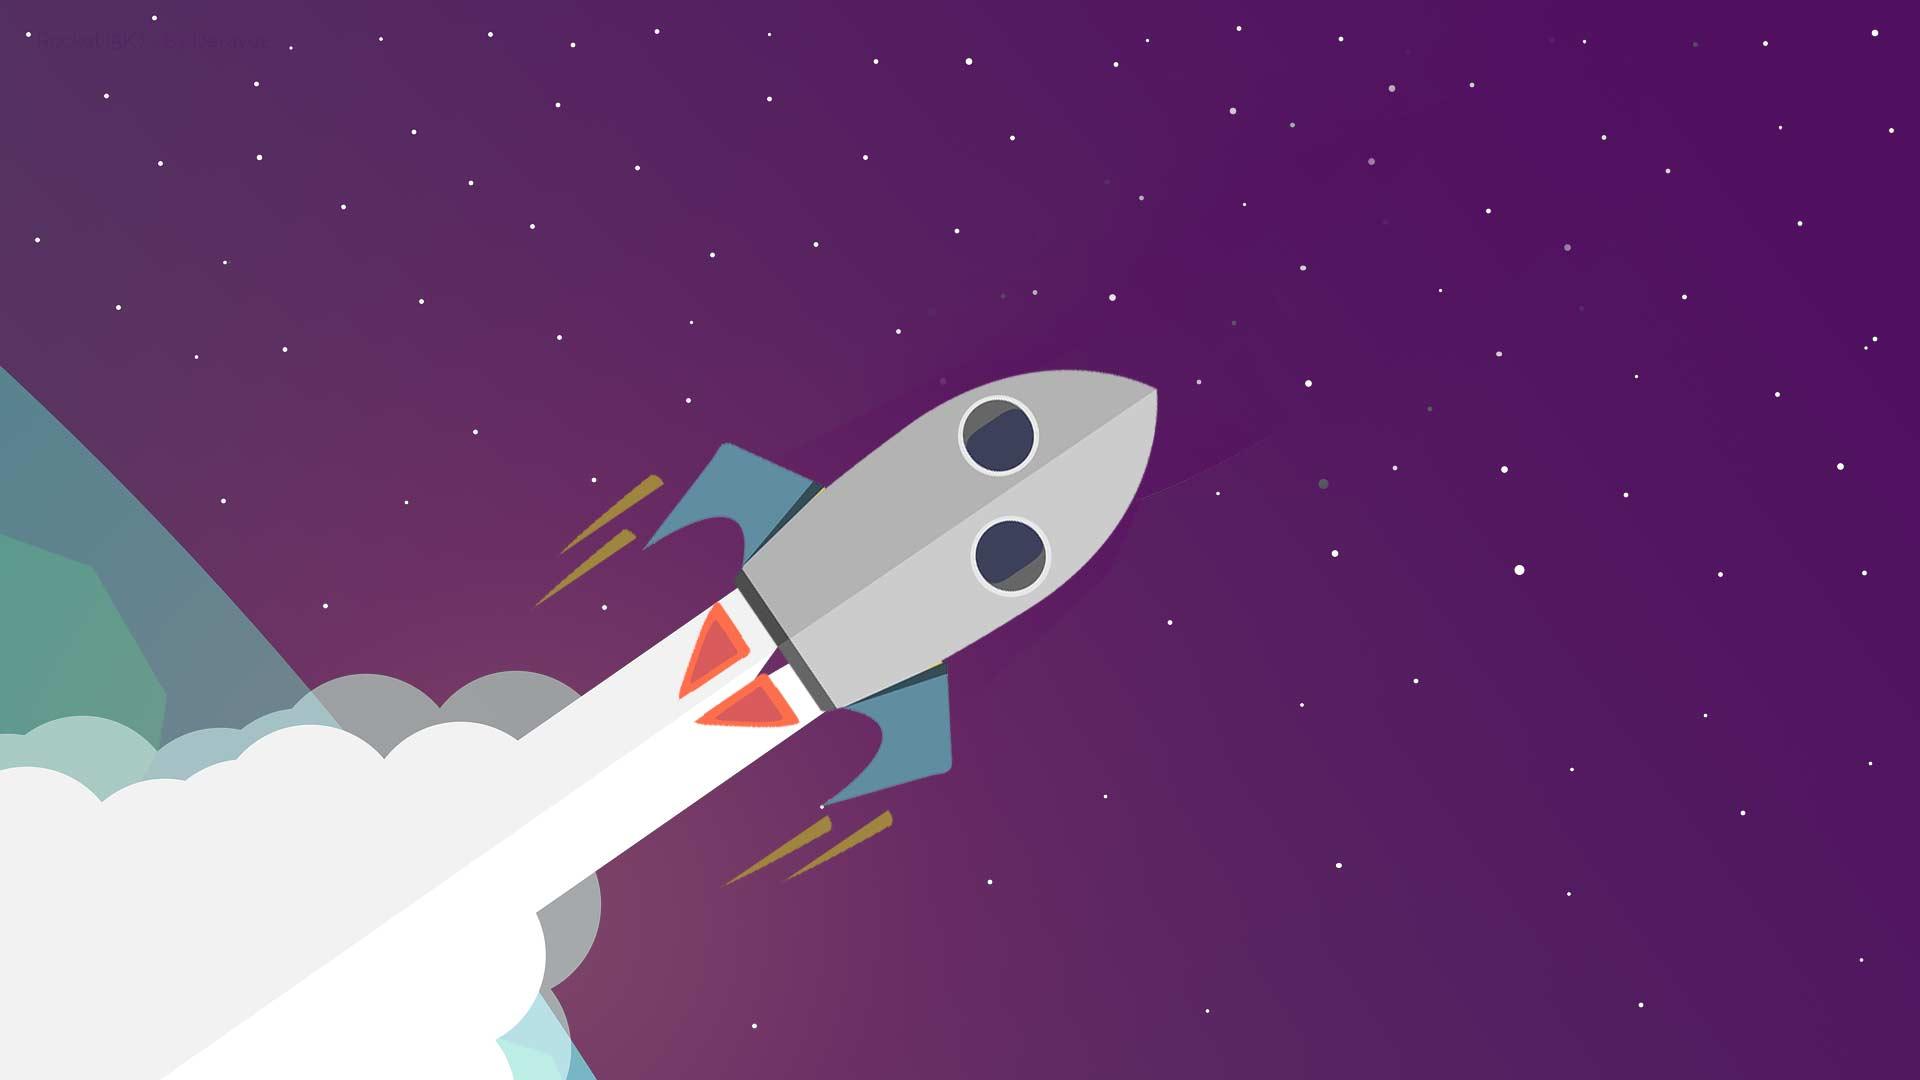 Illustrated rocket shooting through space